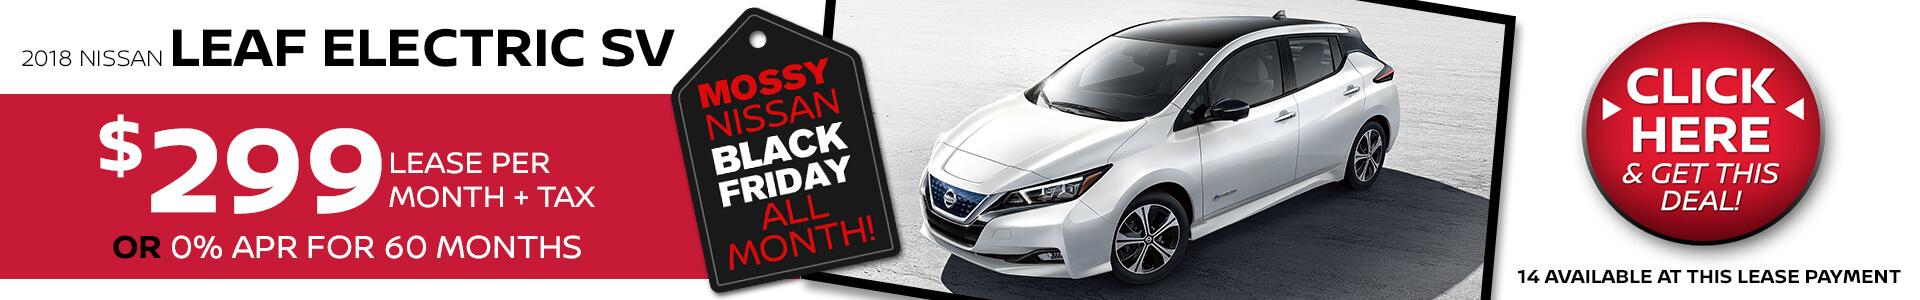 Nissan Leaf $299 Lease